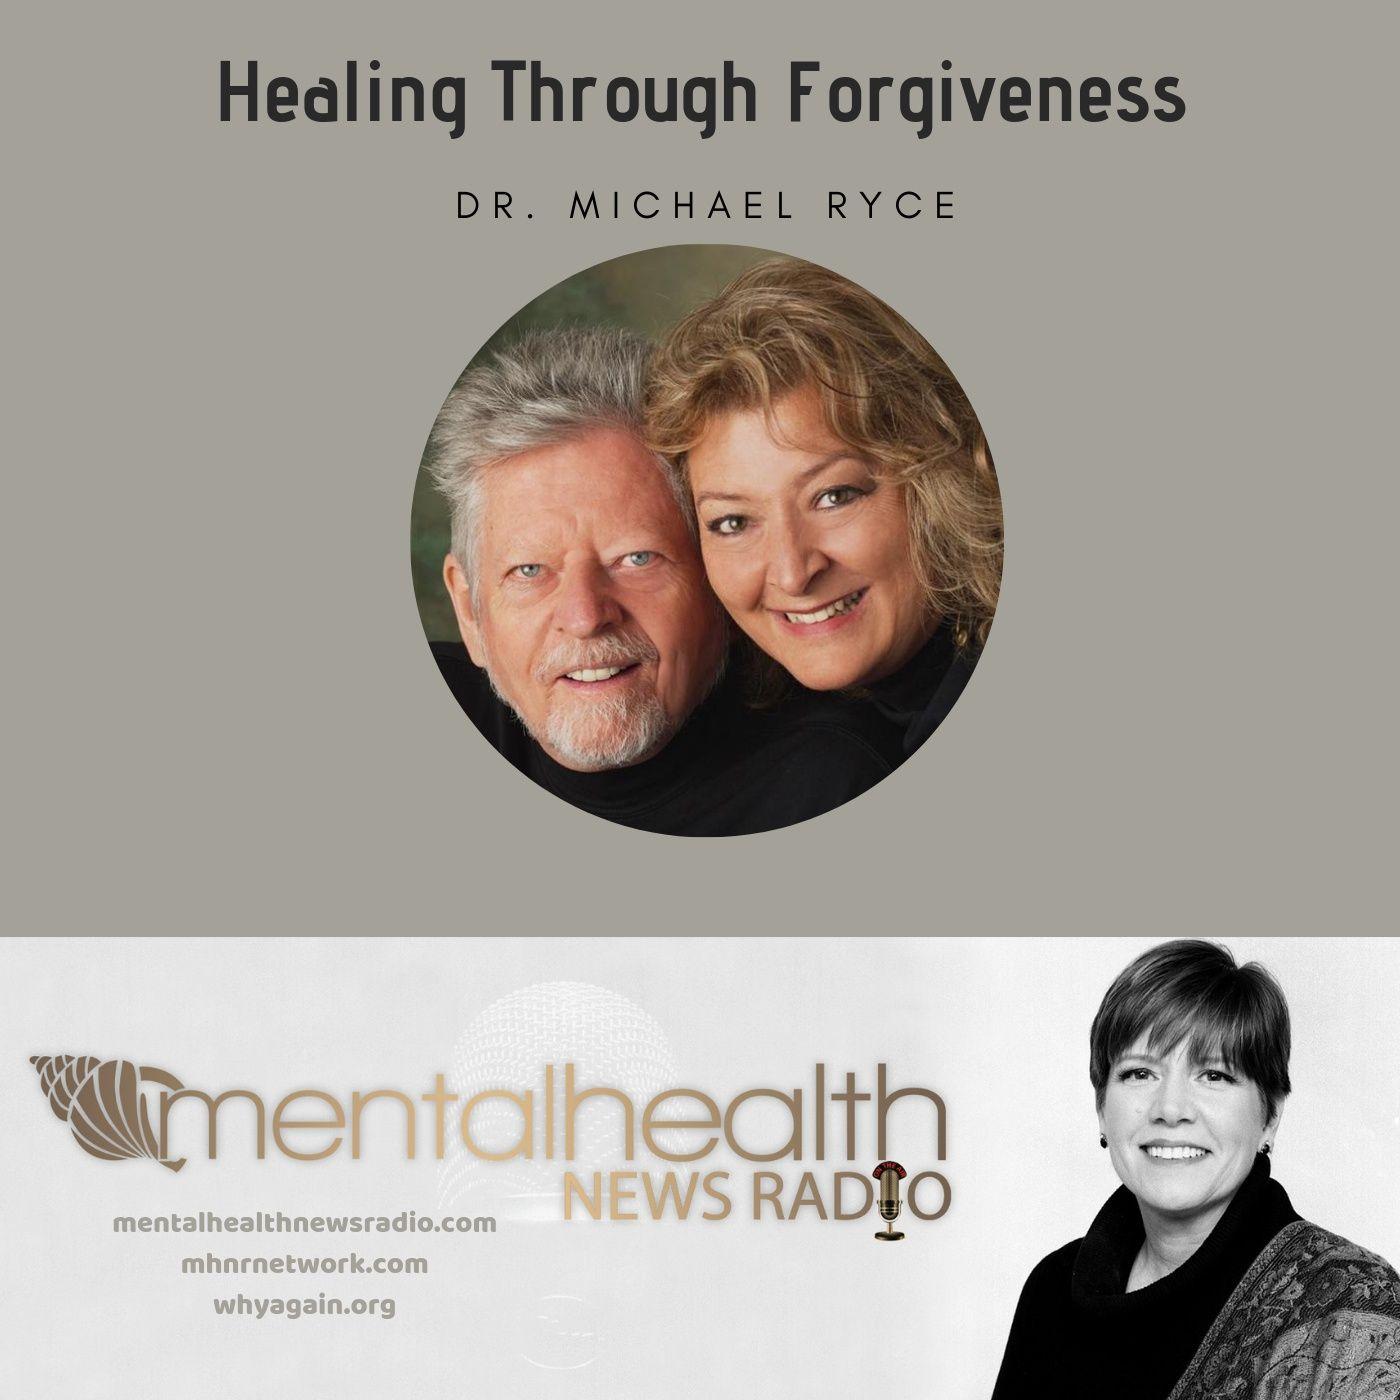 Mental Health News Radio - Healing through Forgiveness with Dr. Michael Ryce